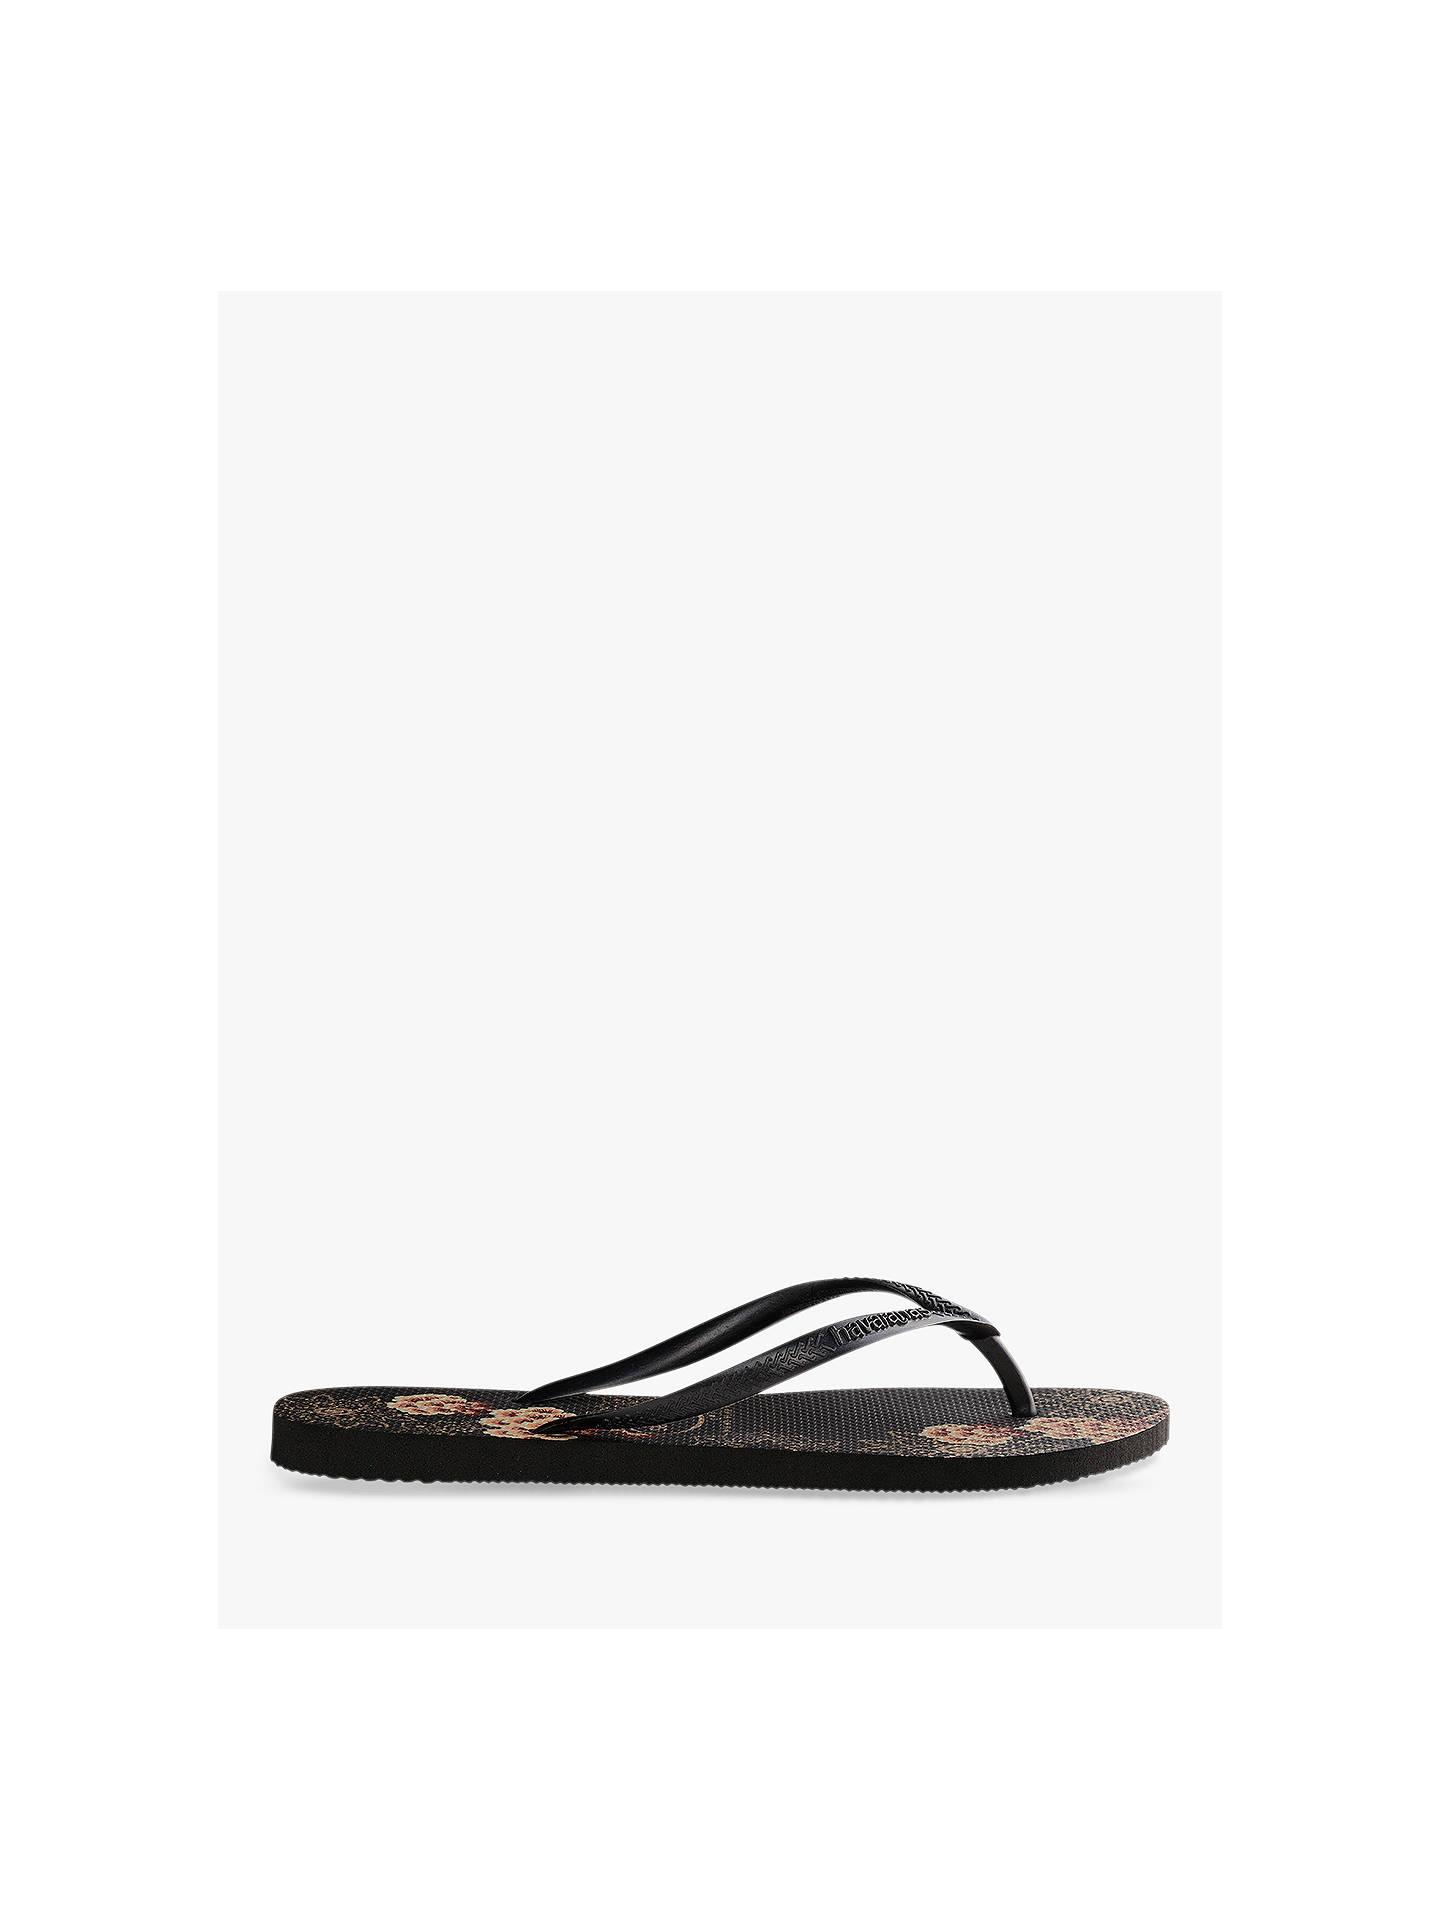 de342755da6 Havaianas Slim Organic Flip Flops